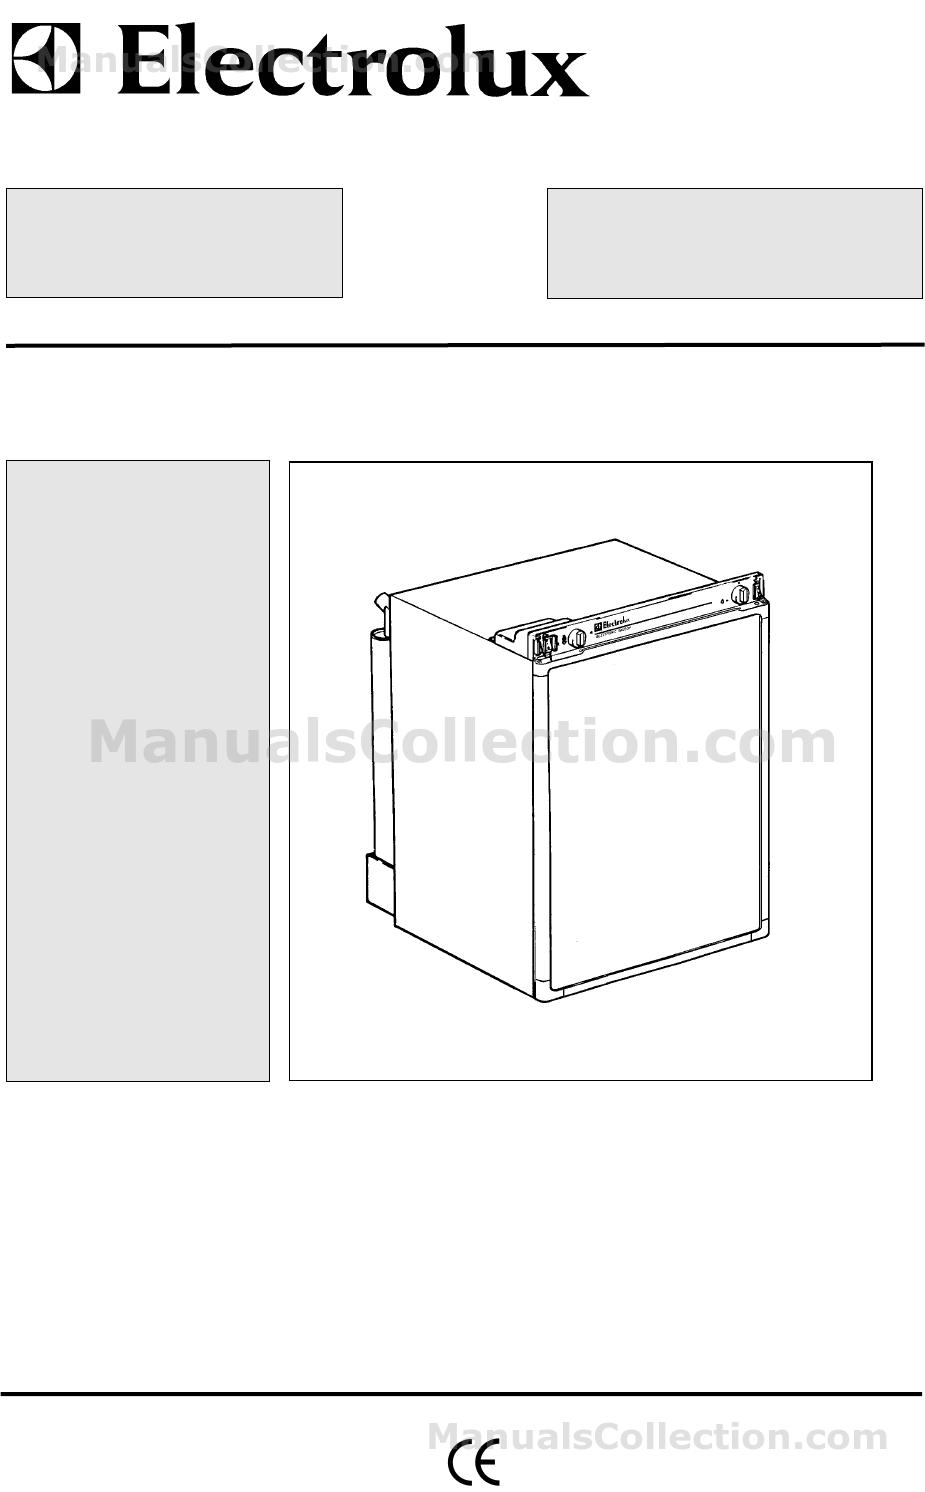 dometic rm4210 manual